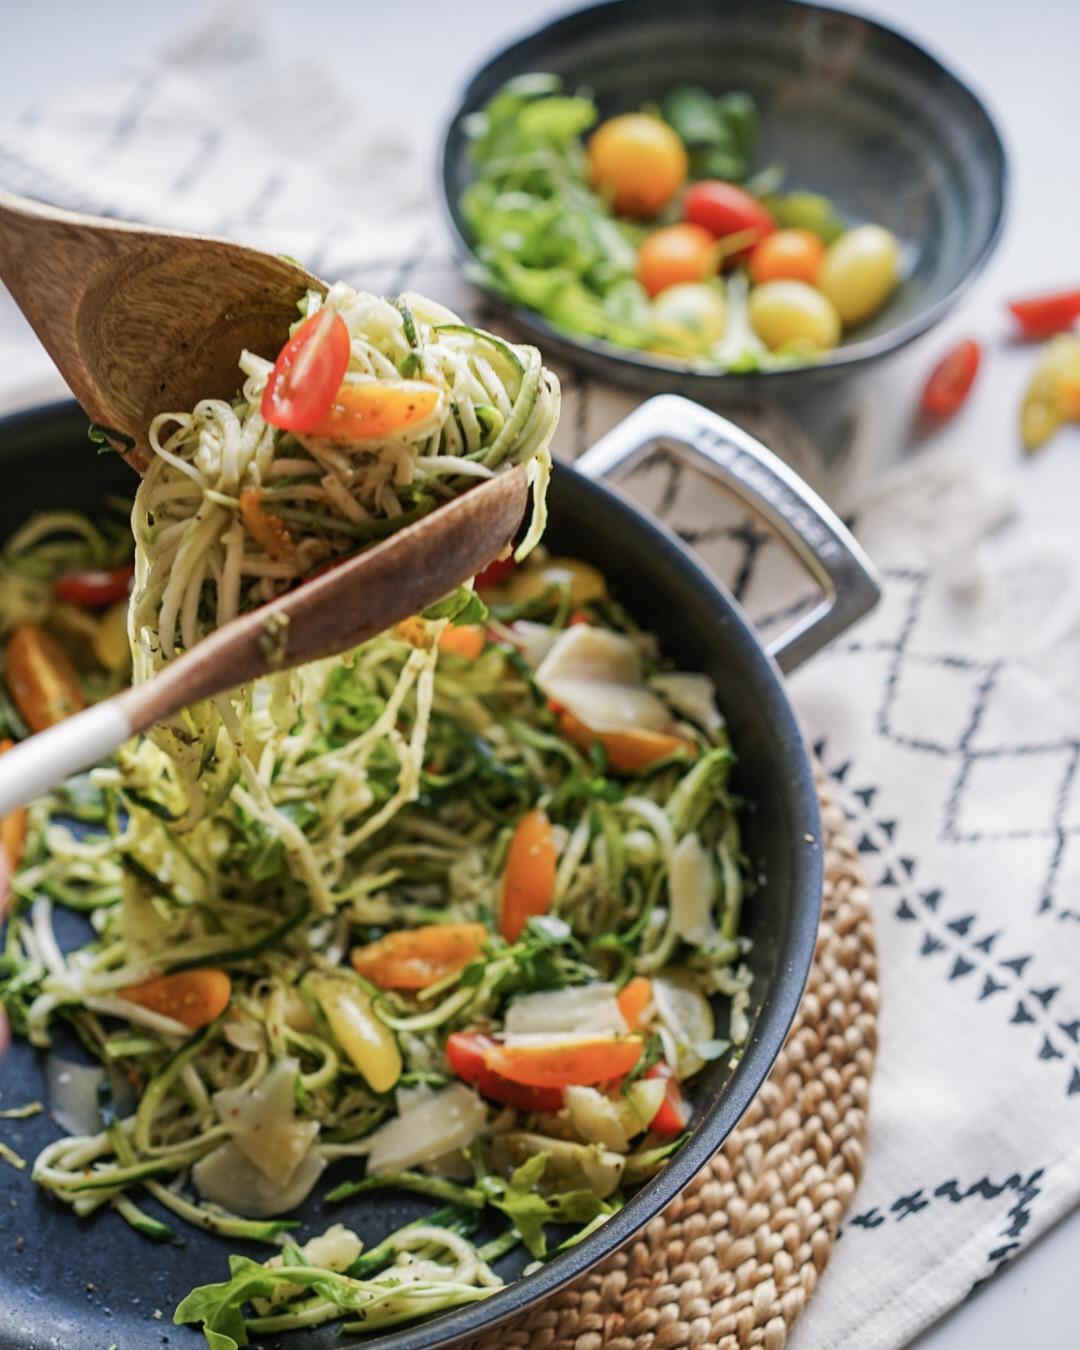 Spaghettis de courgettes au pesto et tomates cerises